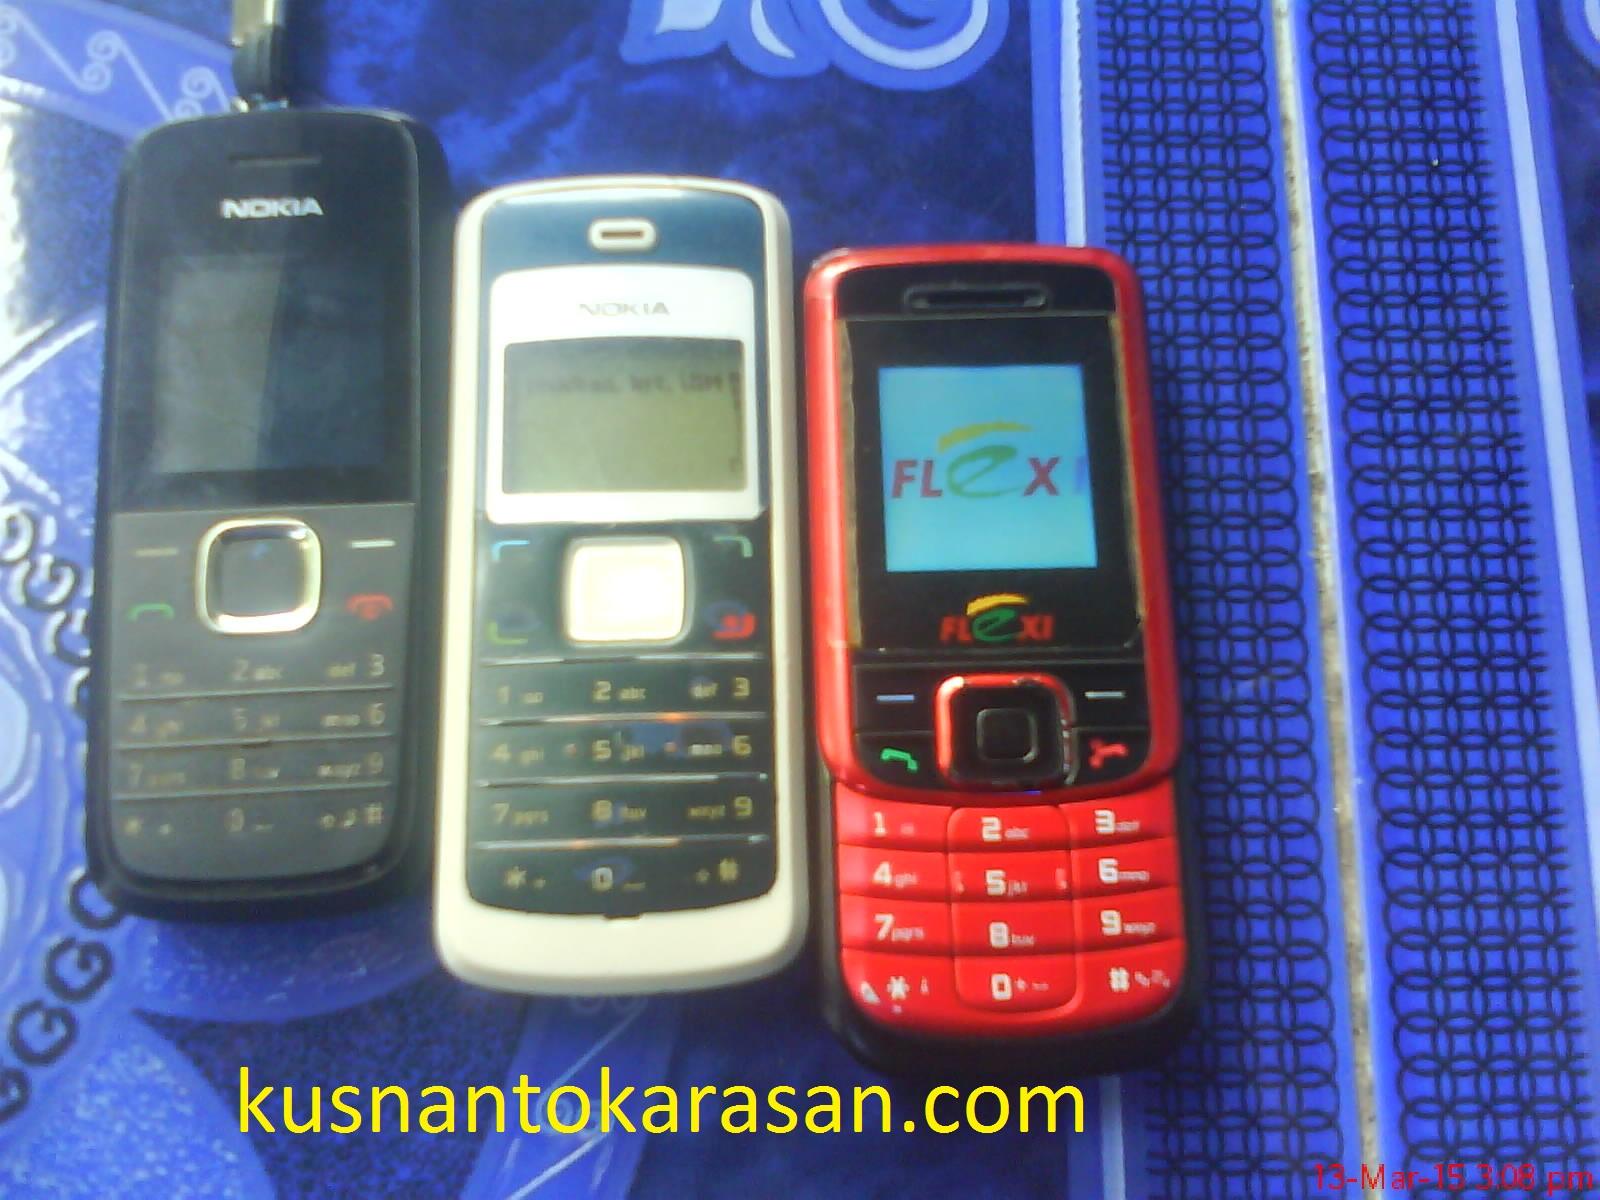 third image of Insentif Penukaran Kartu Telkom Flexi Ke Telkomsel Di with insentif penukaran kartu telkom flexi ke telkomsel di ...